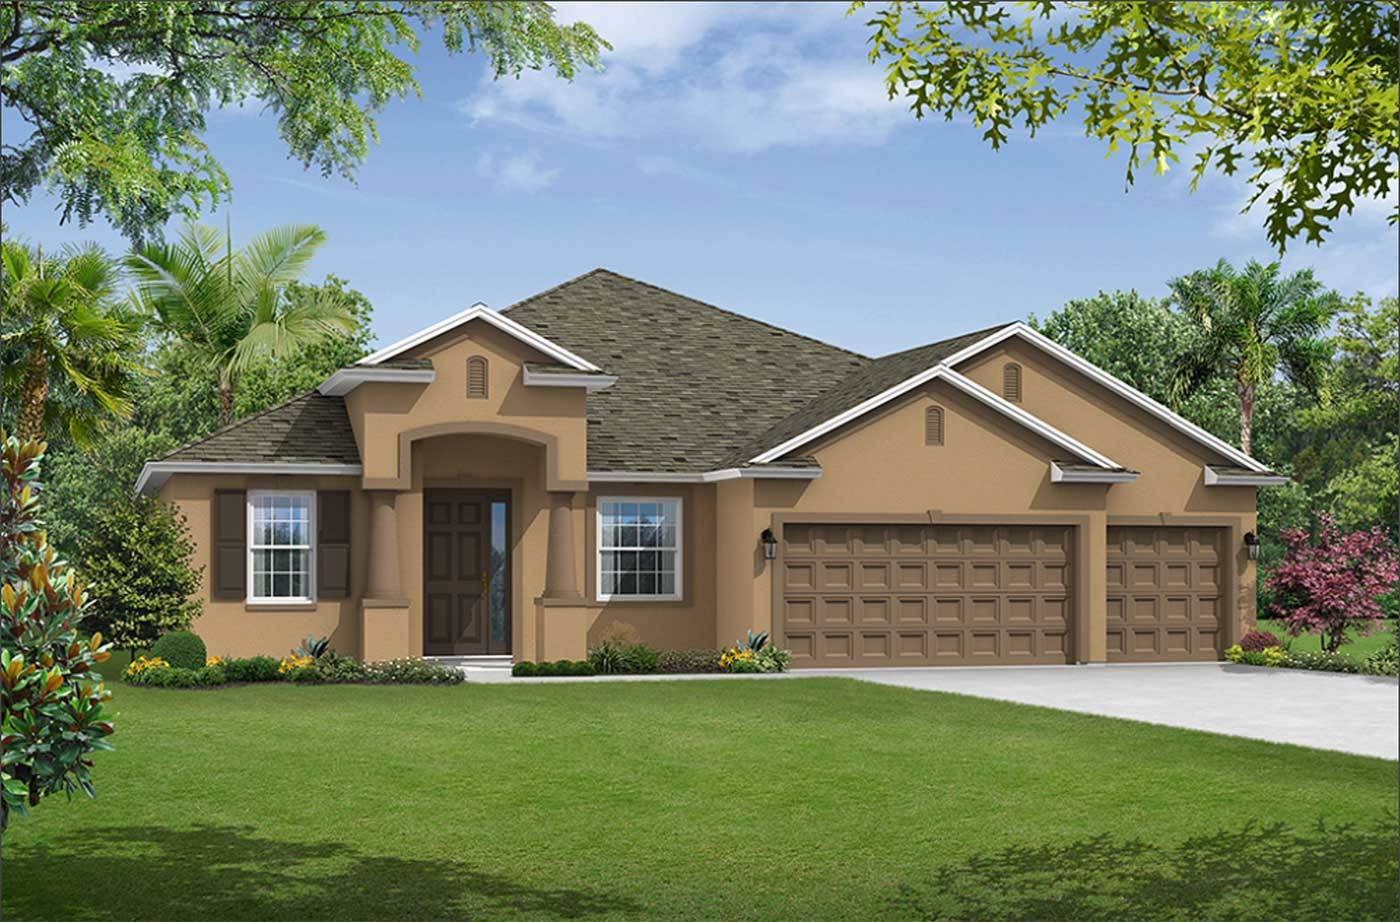 3921 Salida DelSol Drive Sun City Center FL 33573 new construction home for sale William Ryan Hom...:3921 Salida DelSol Drive - Jensen - New Construction Home for Sale - Ruskin / Sun City Center, FL